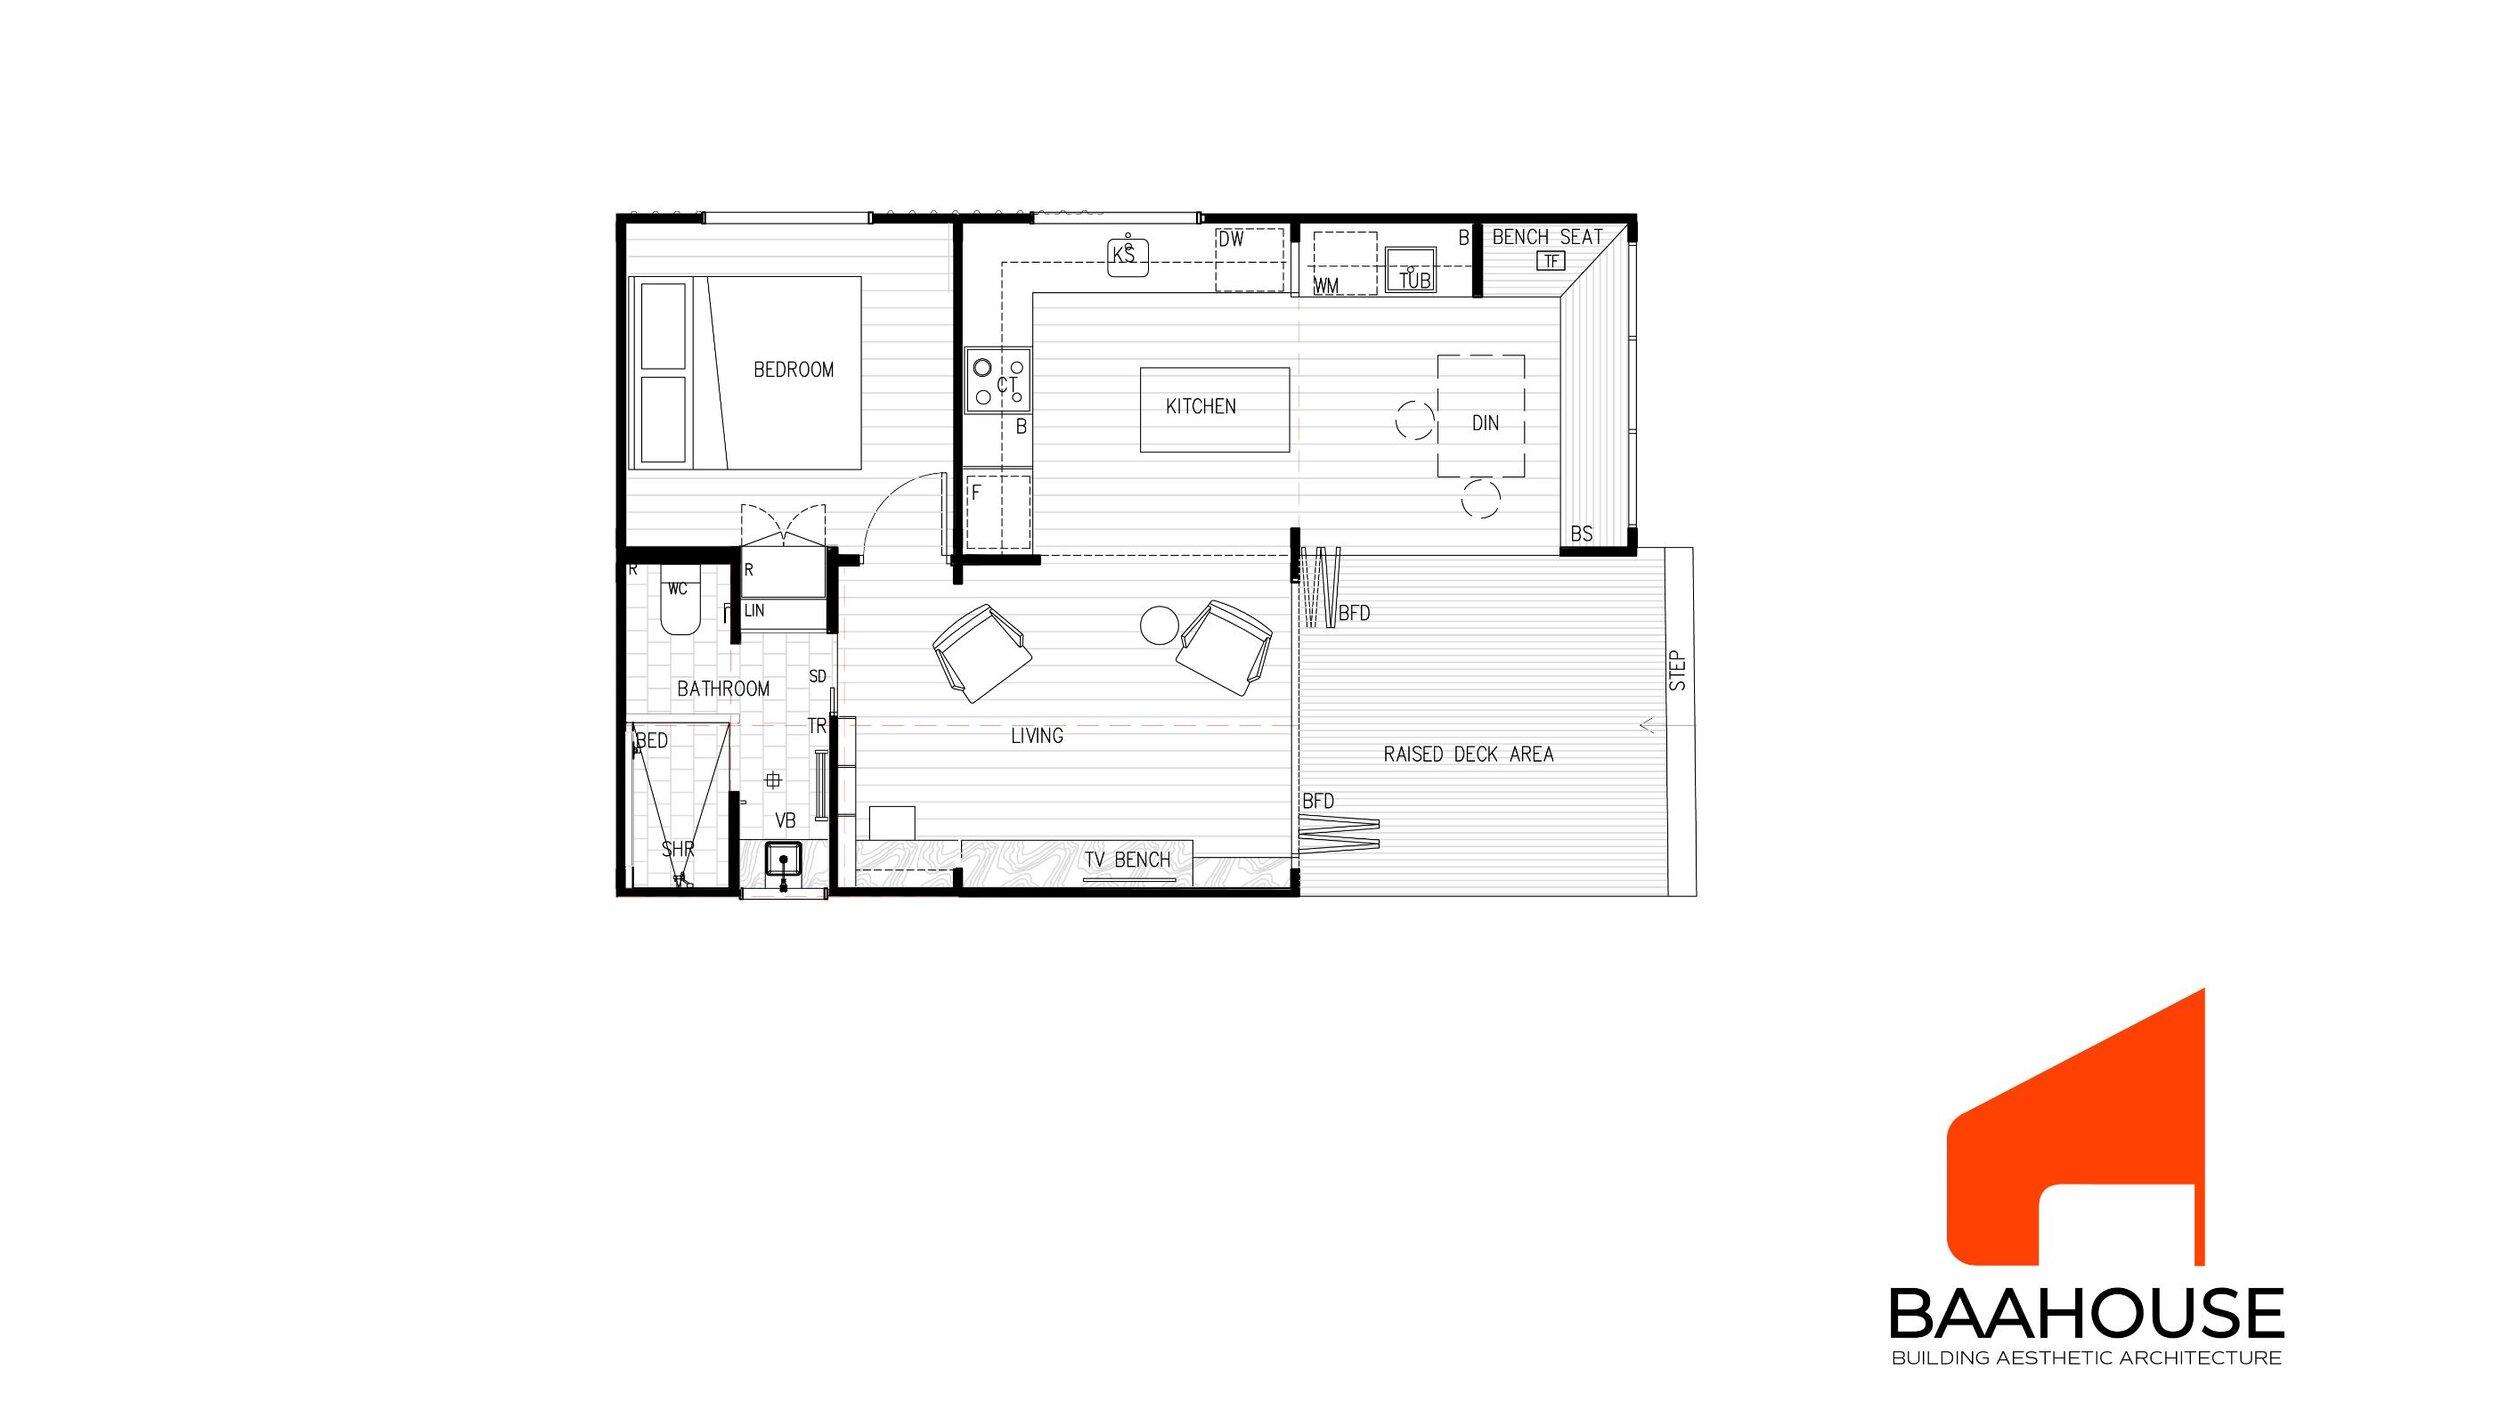 BAAHOUSE MODULAR- 1 BEDROOM OPTION 1